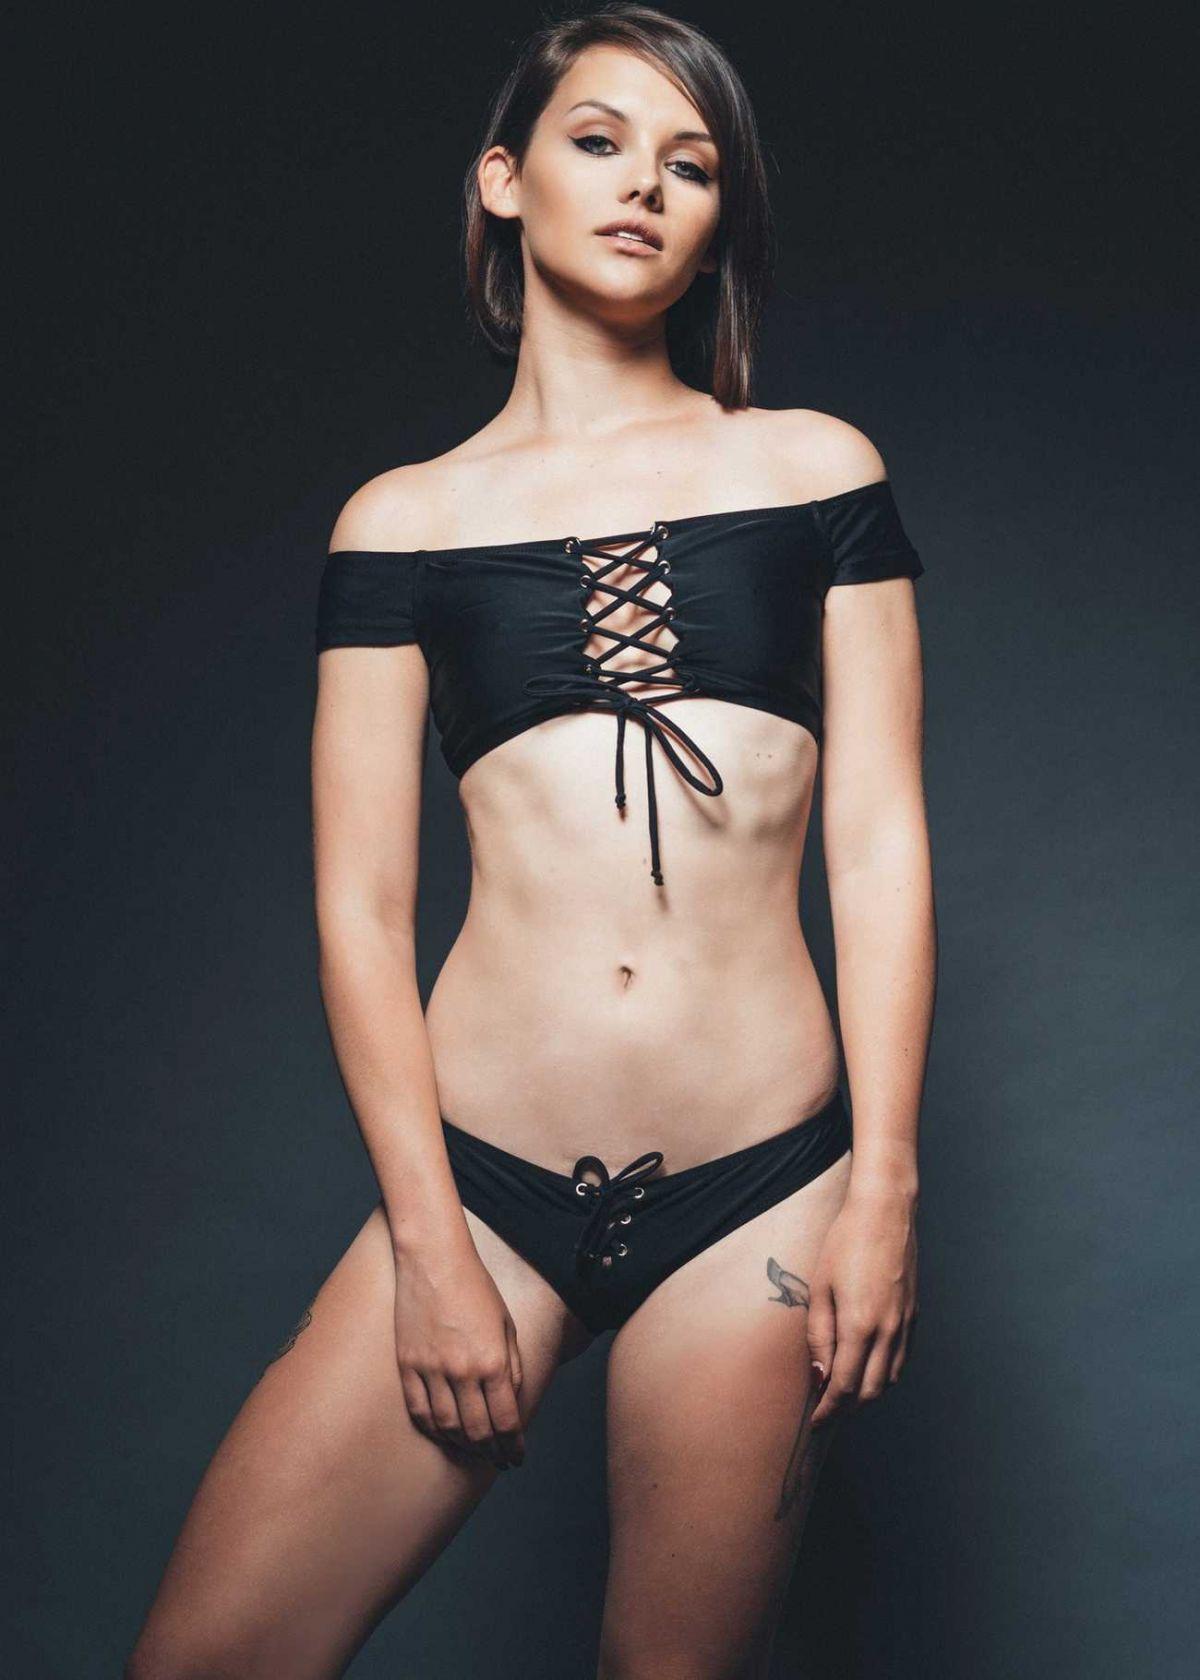 Model Mellisa Clarke naked (61 photos), Ass, Hot, Selfie, in bikini 2018